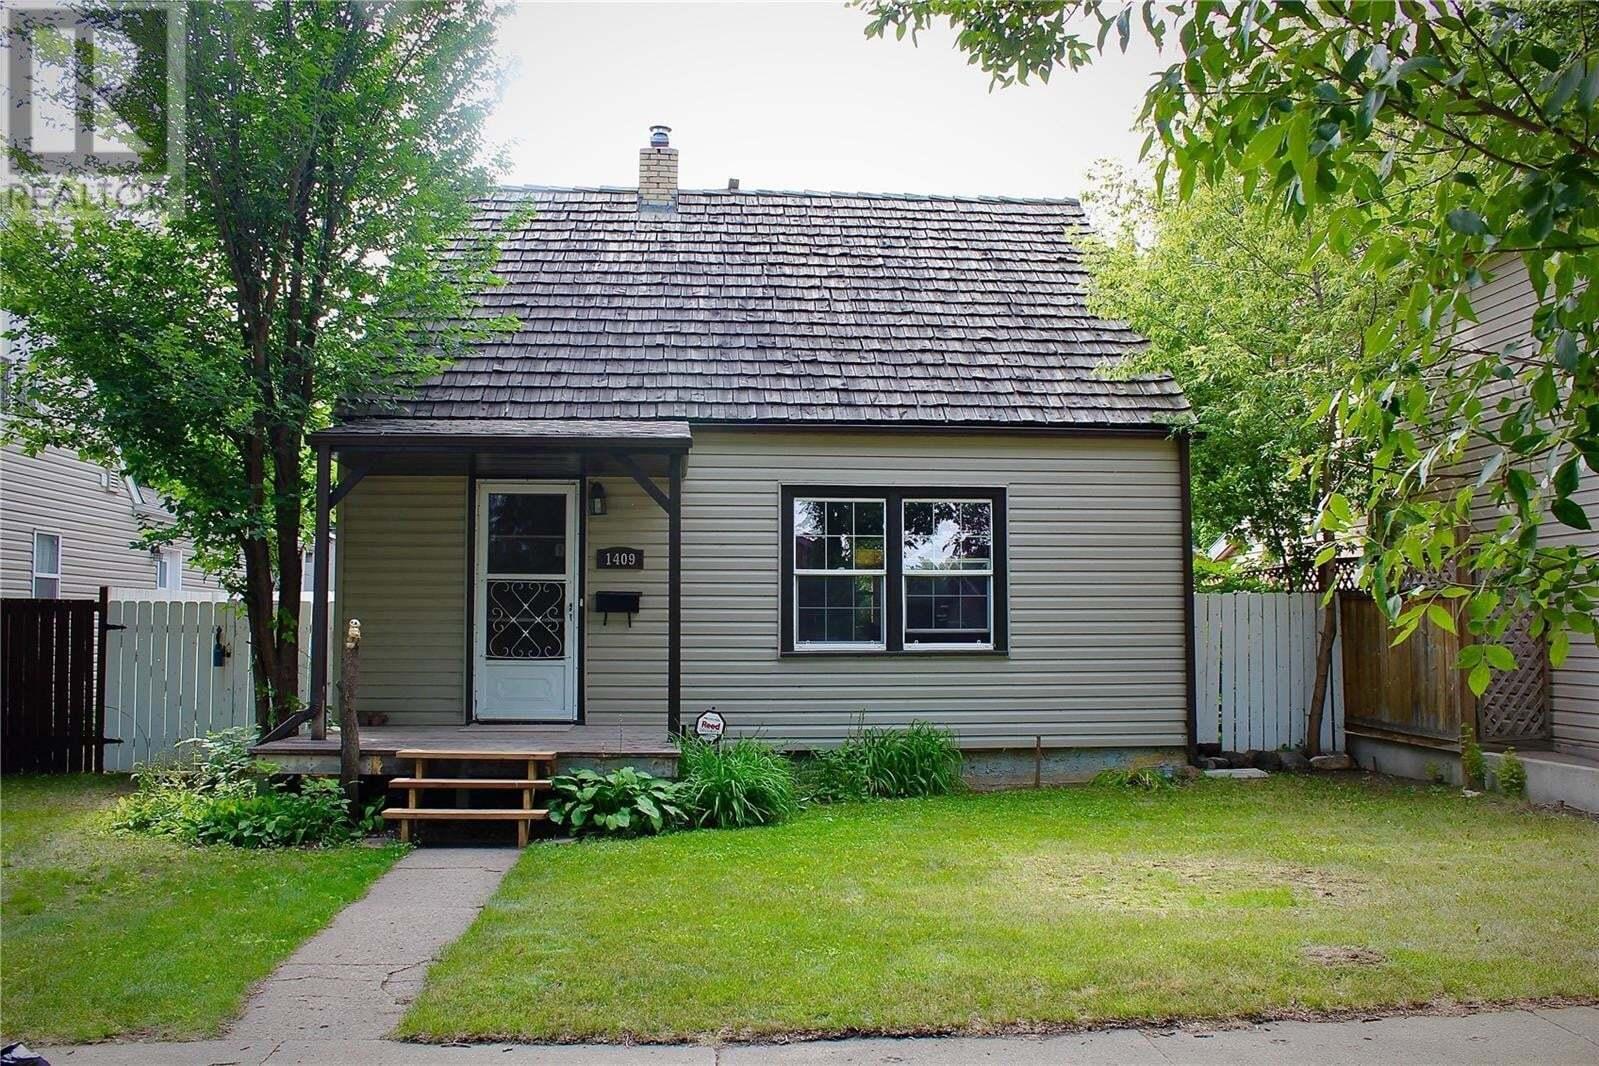 House for sale at 1409 B Ave N Saskatoon Saskatchewan - MLS: SK821338